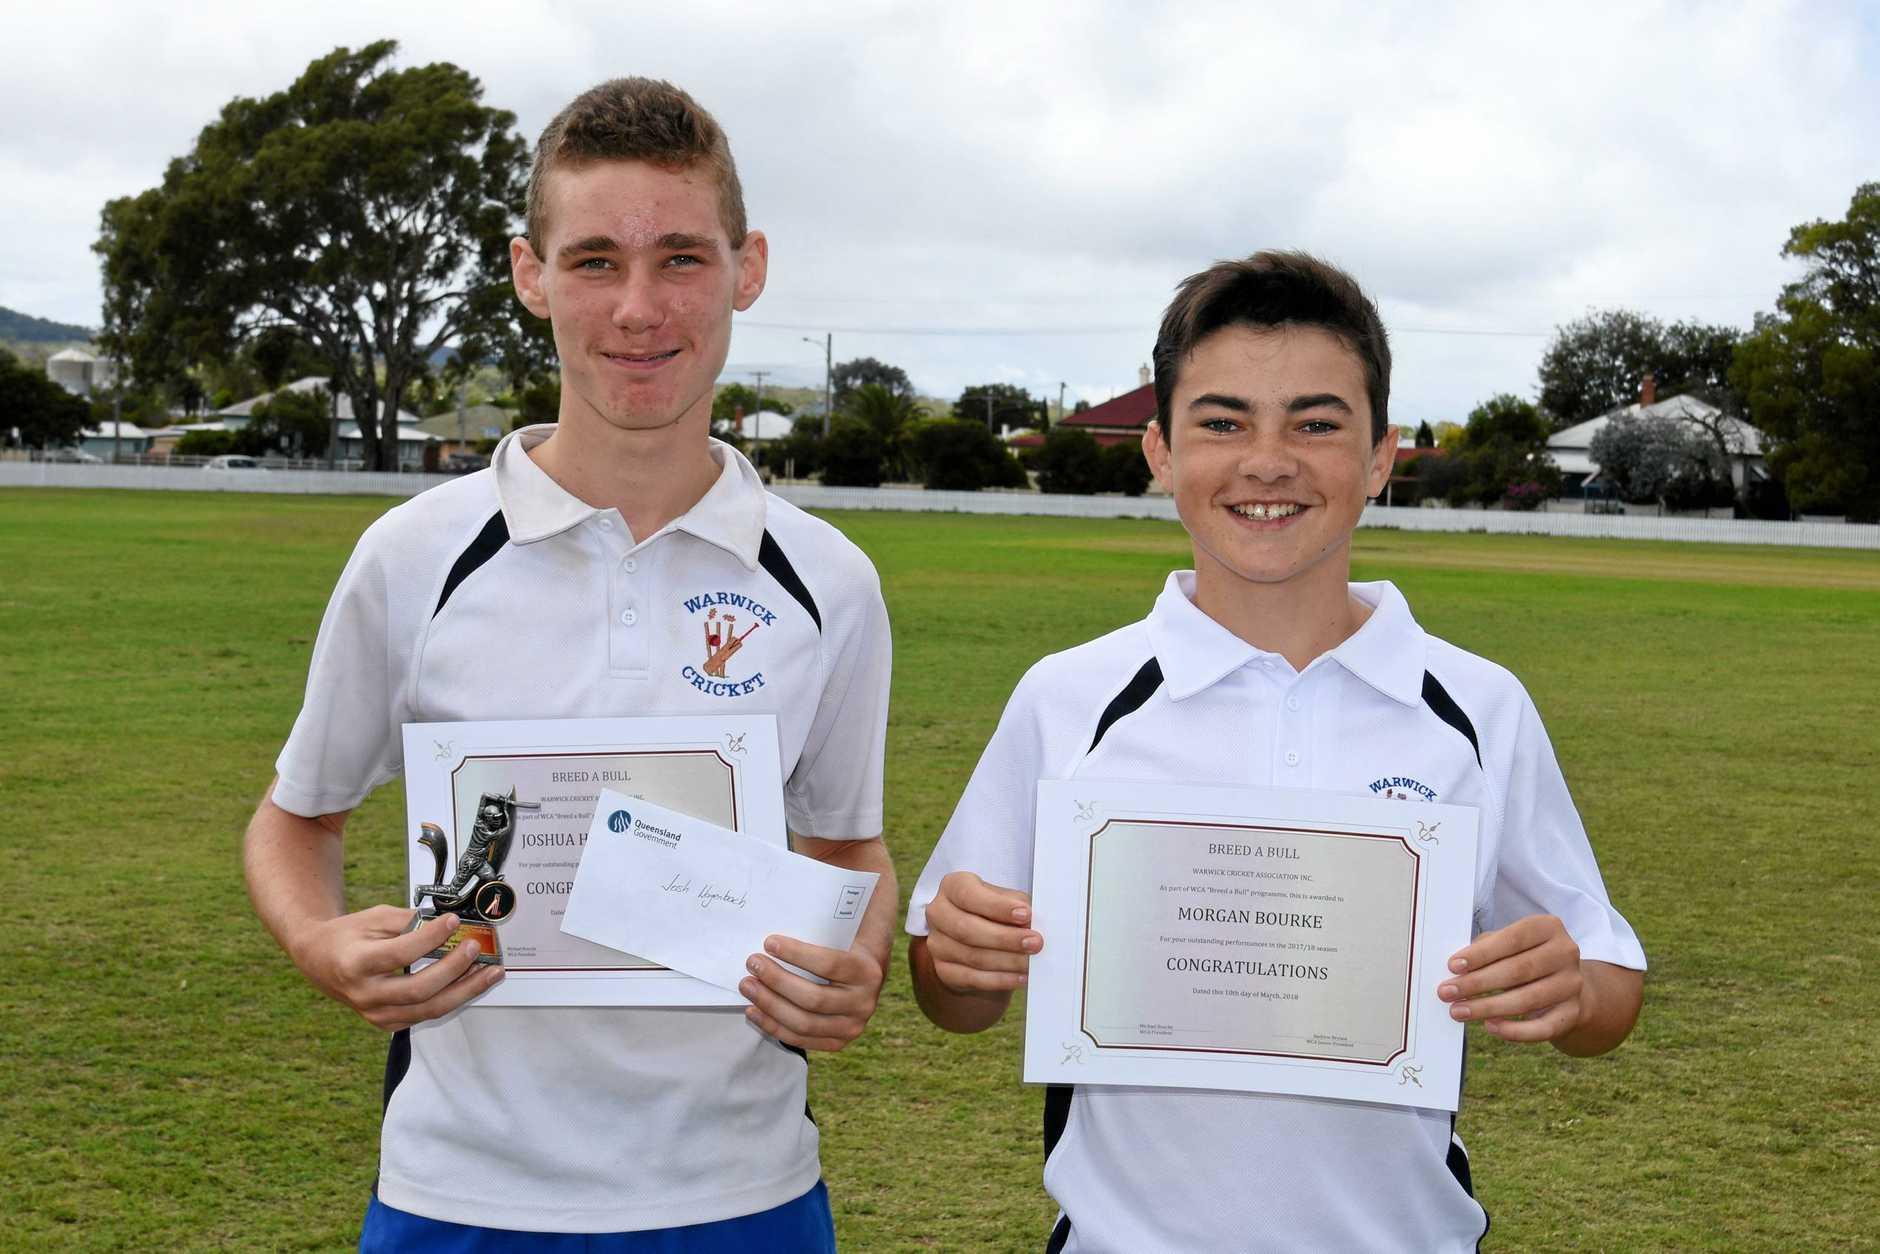 Josh Hagenbach, 13, (left) and Morgan Bourke, 13, won the Breed a Bull Bursary.